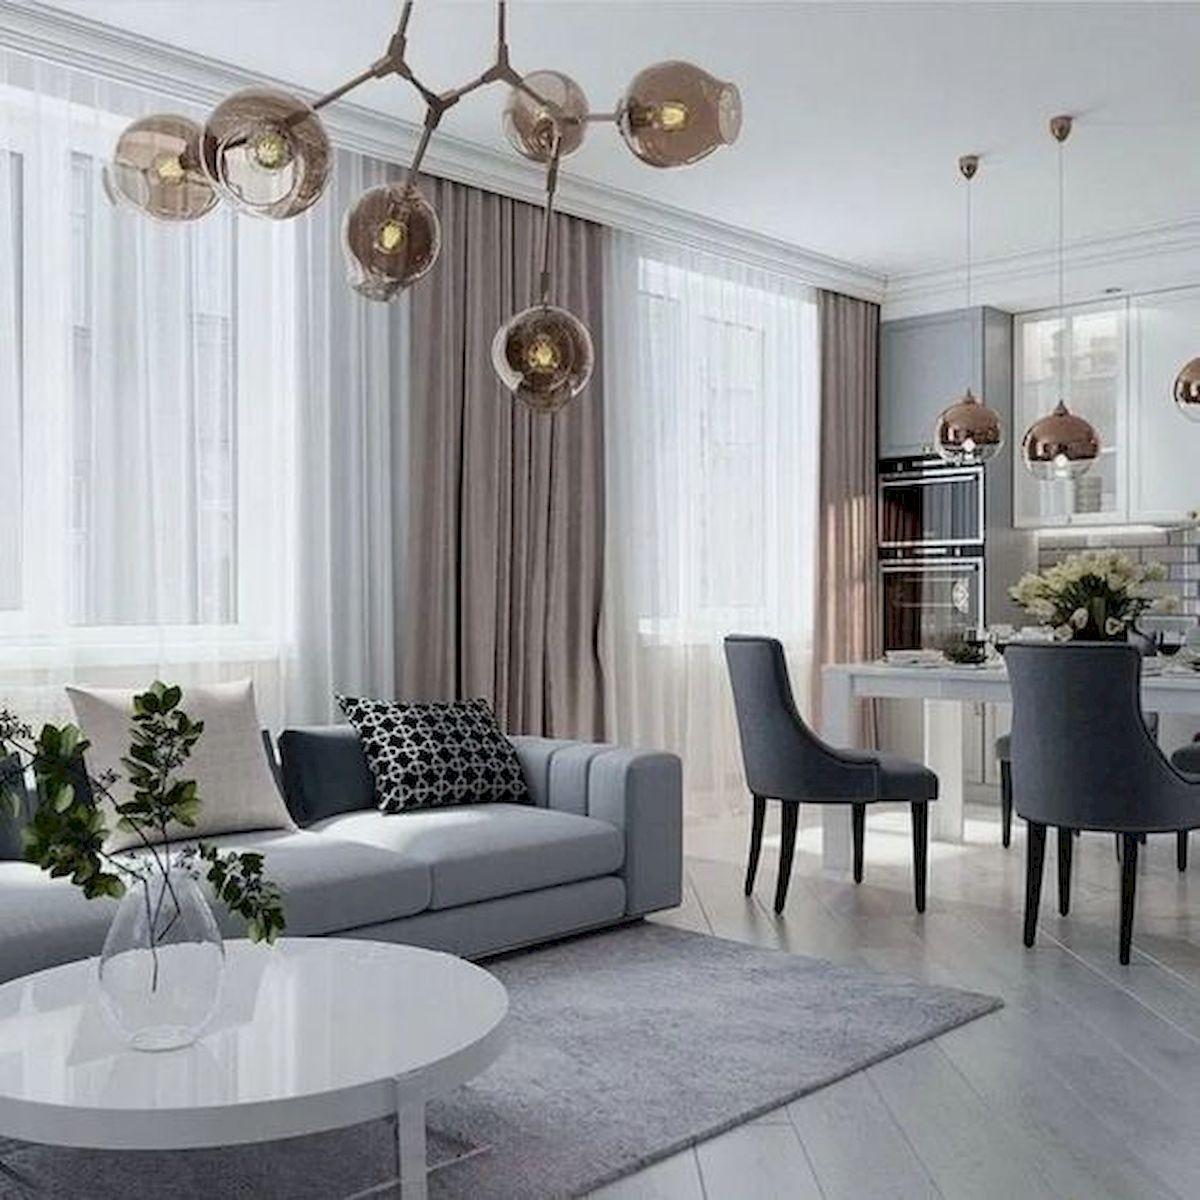 36 Elegant Living Room Design And Decor Ideas Elegant Li